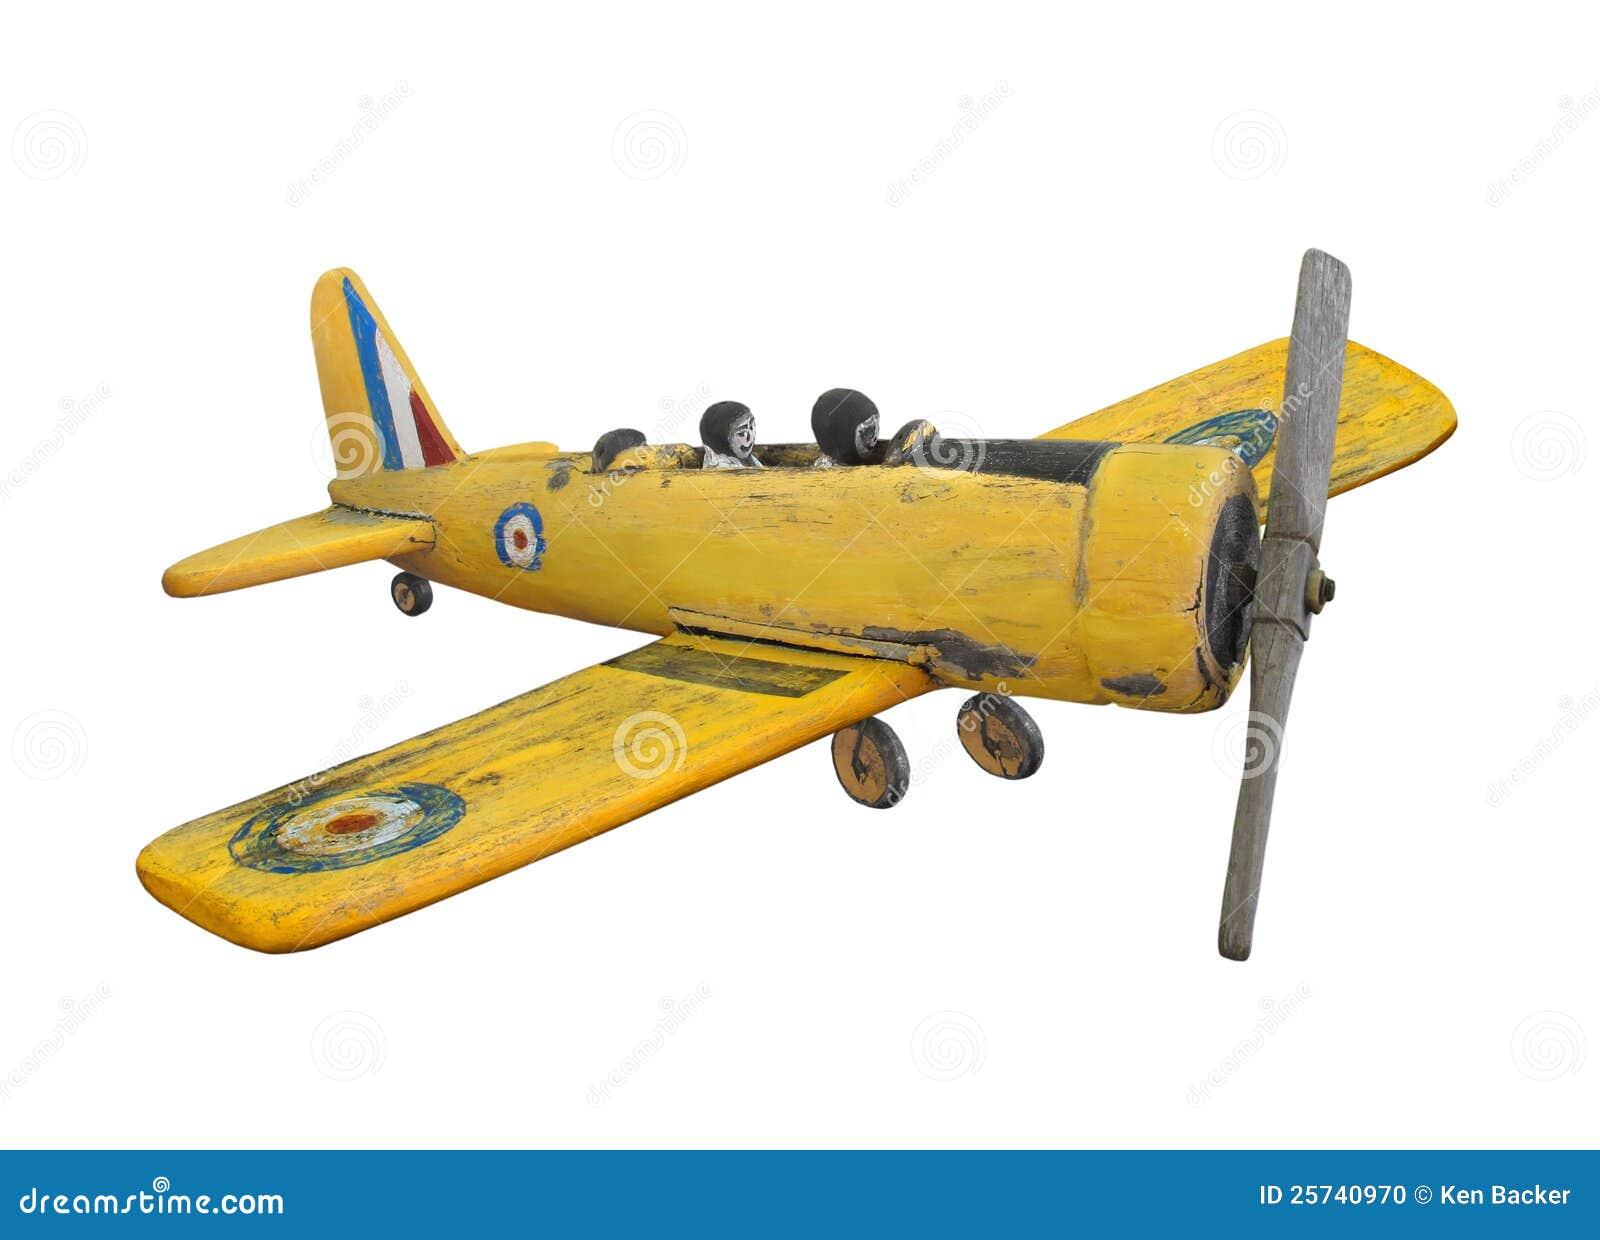 Wooden Folk Art Airplane Toy Isolated. Stock Photo - Image ...